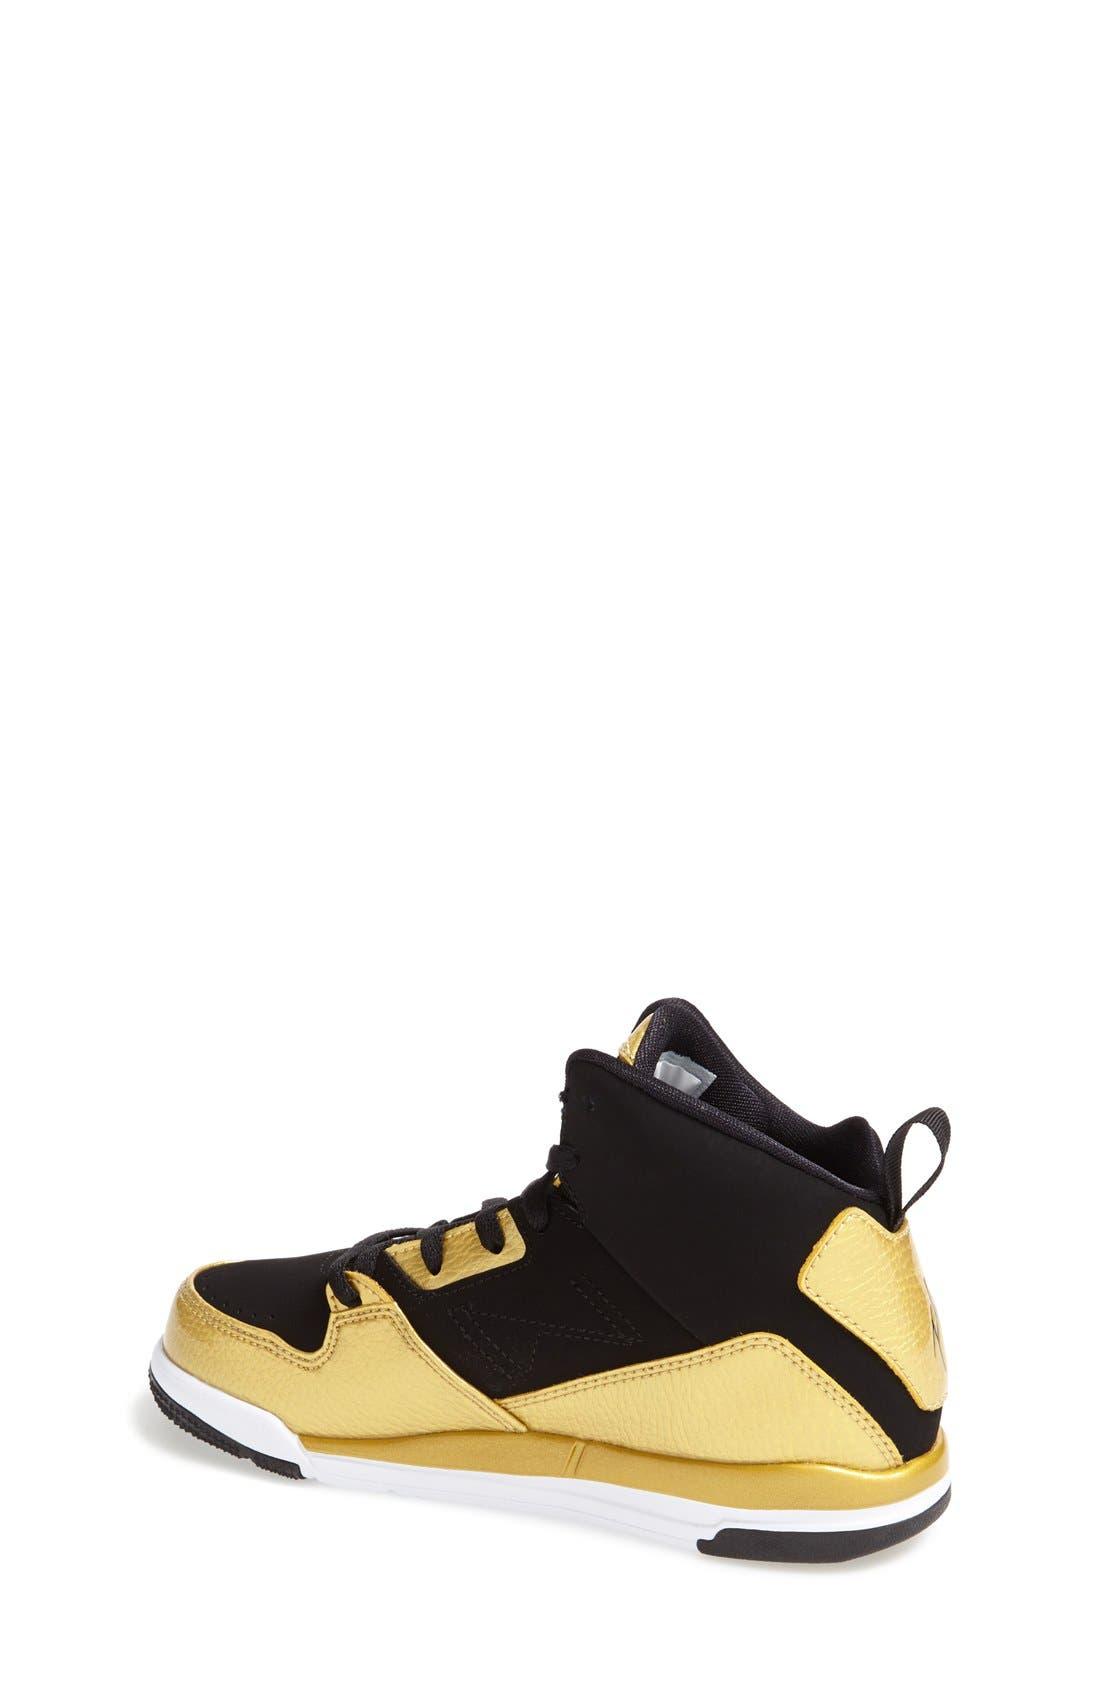 Alternate Image 2  - Nike 'Jordan SC3' Basketball Shoe (Toddler & Little Kid)